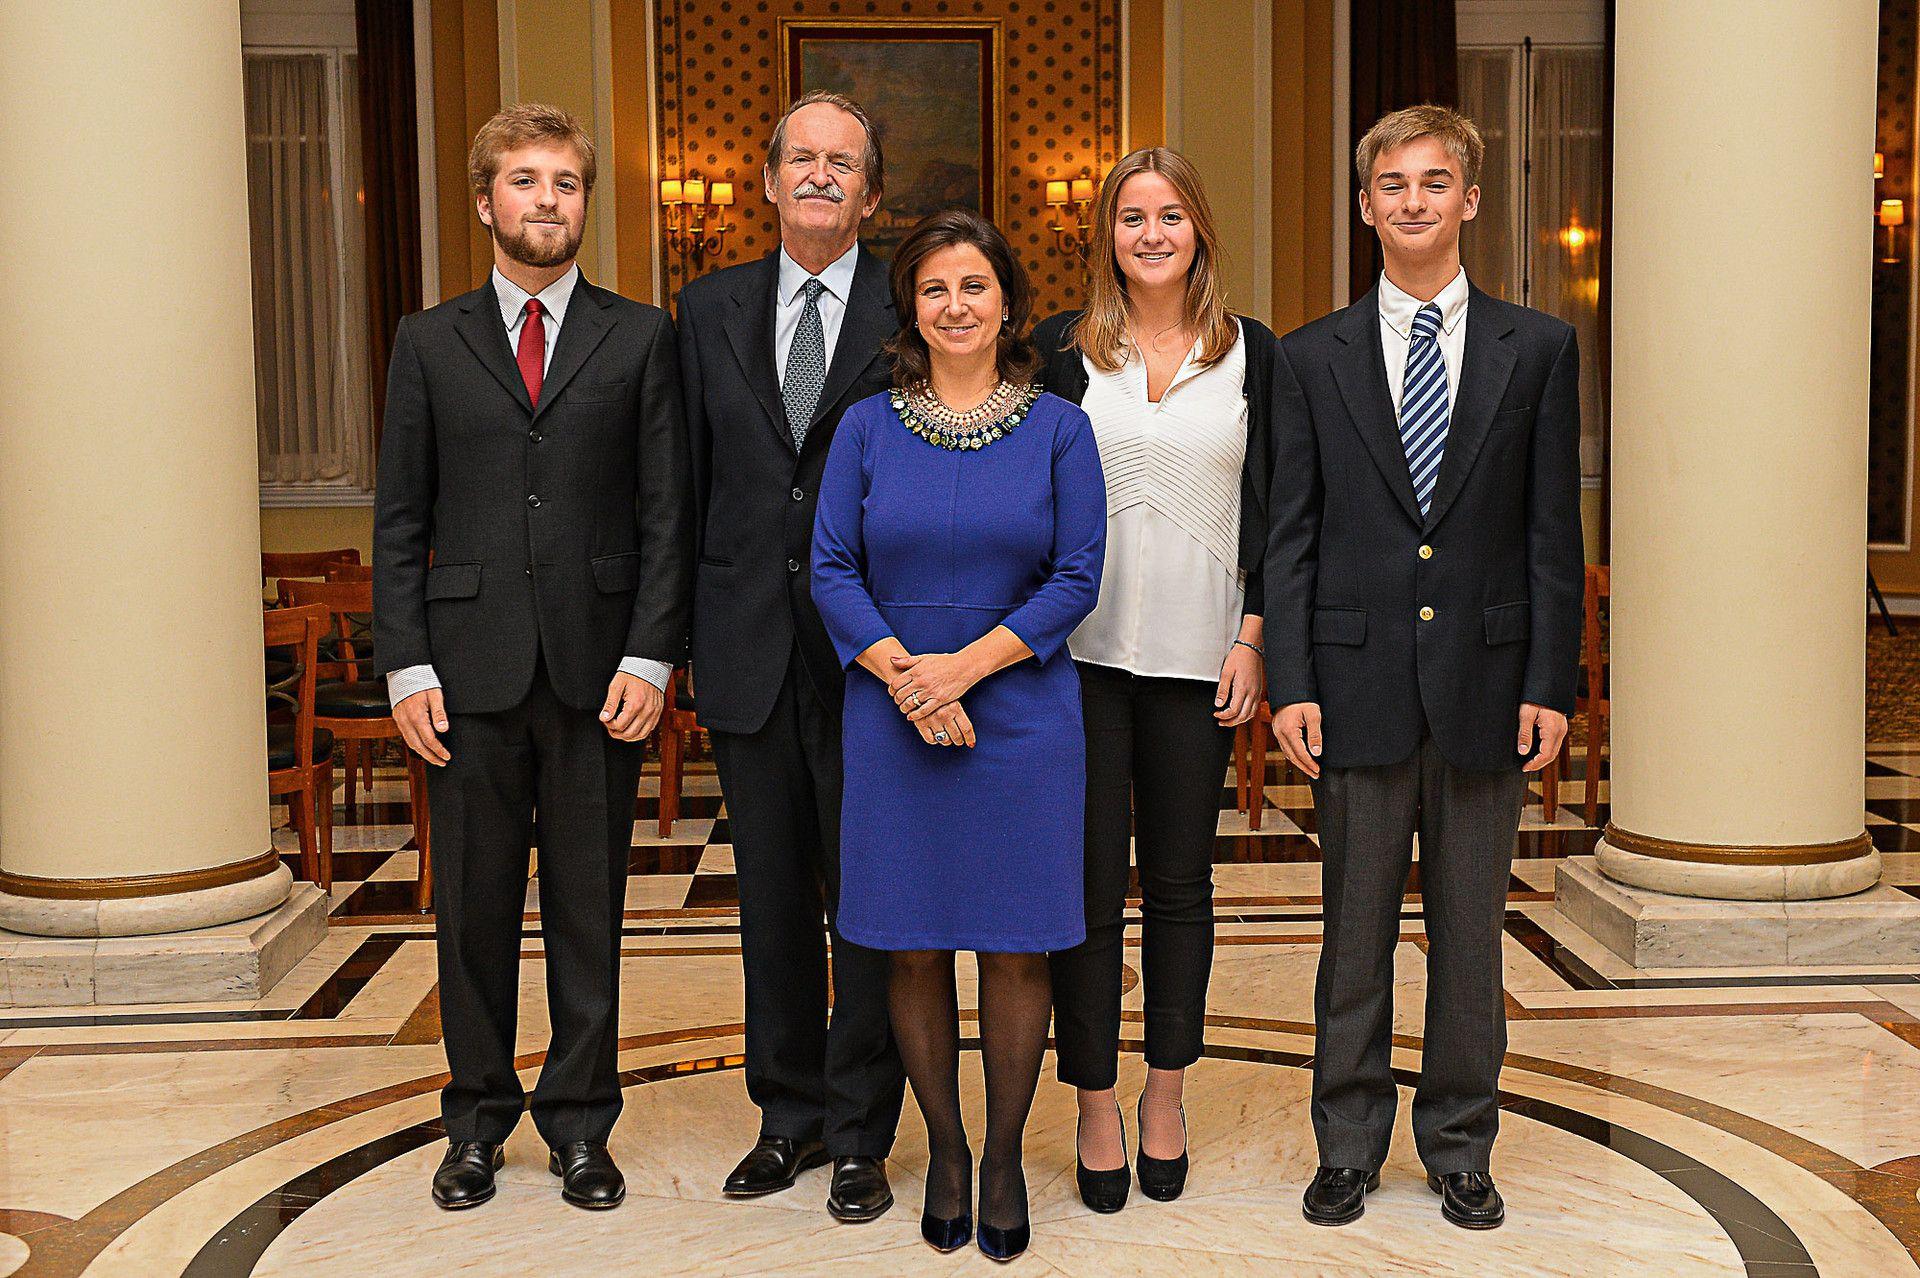 Duques de Braganca - 2015